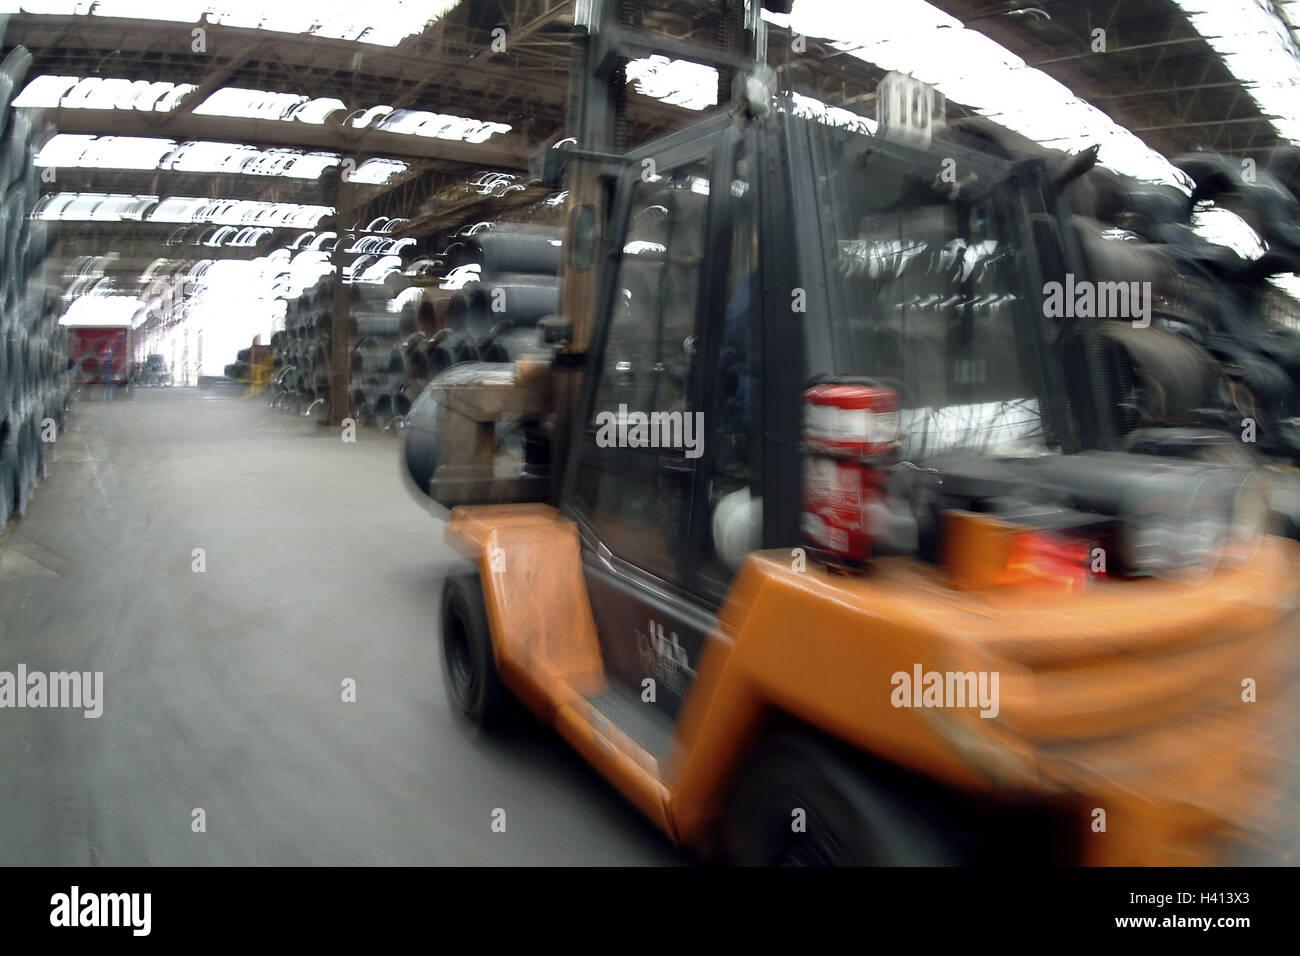 Walzdraht Support Stockfotos & Walzdraht Support Bilder - Alamy